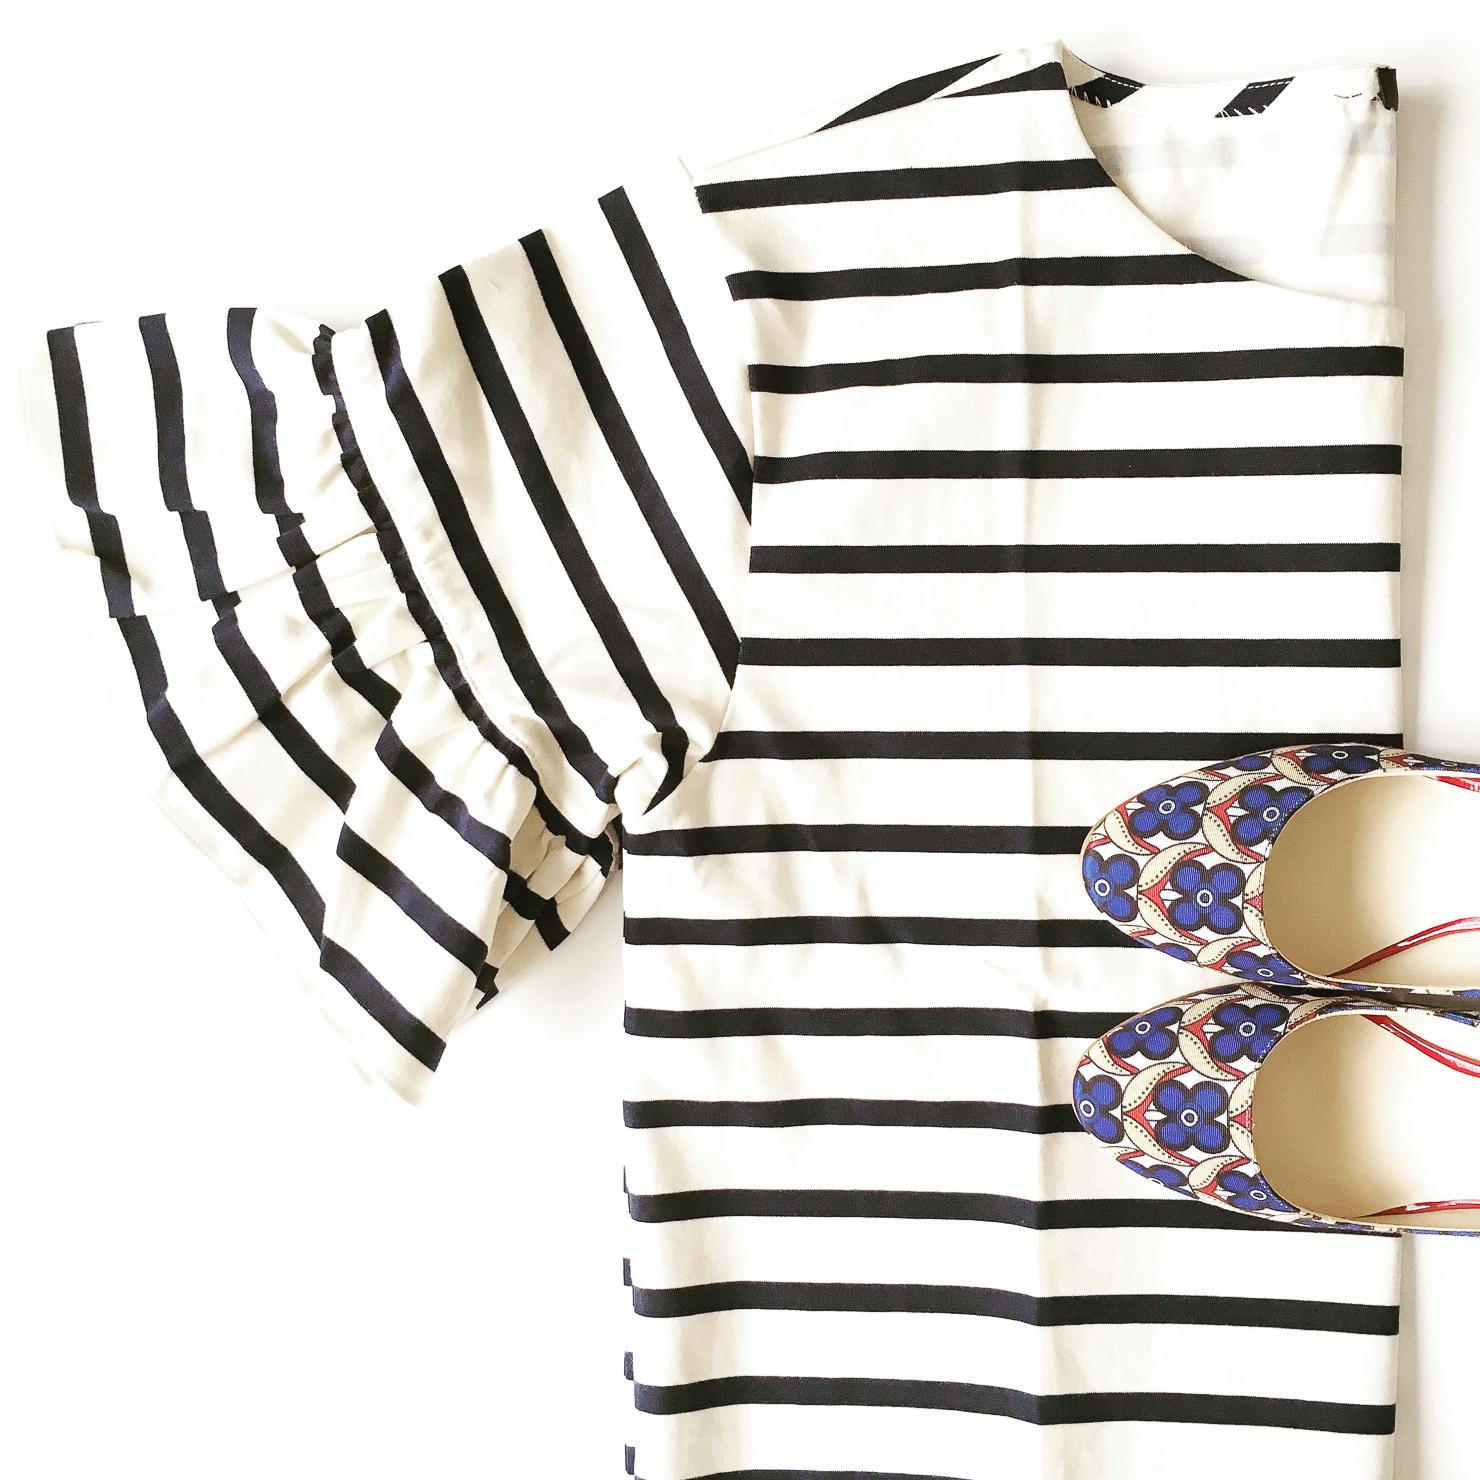 jcrew-striped-ruffle-sleeve-top-printed-nine-round-toe-pumps